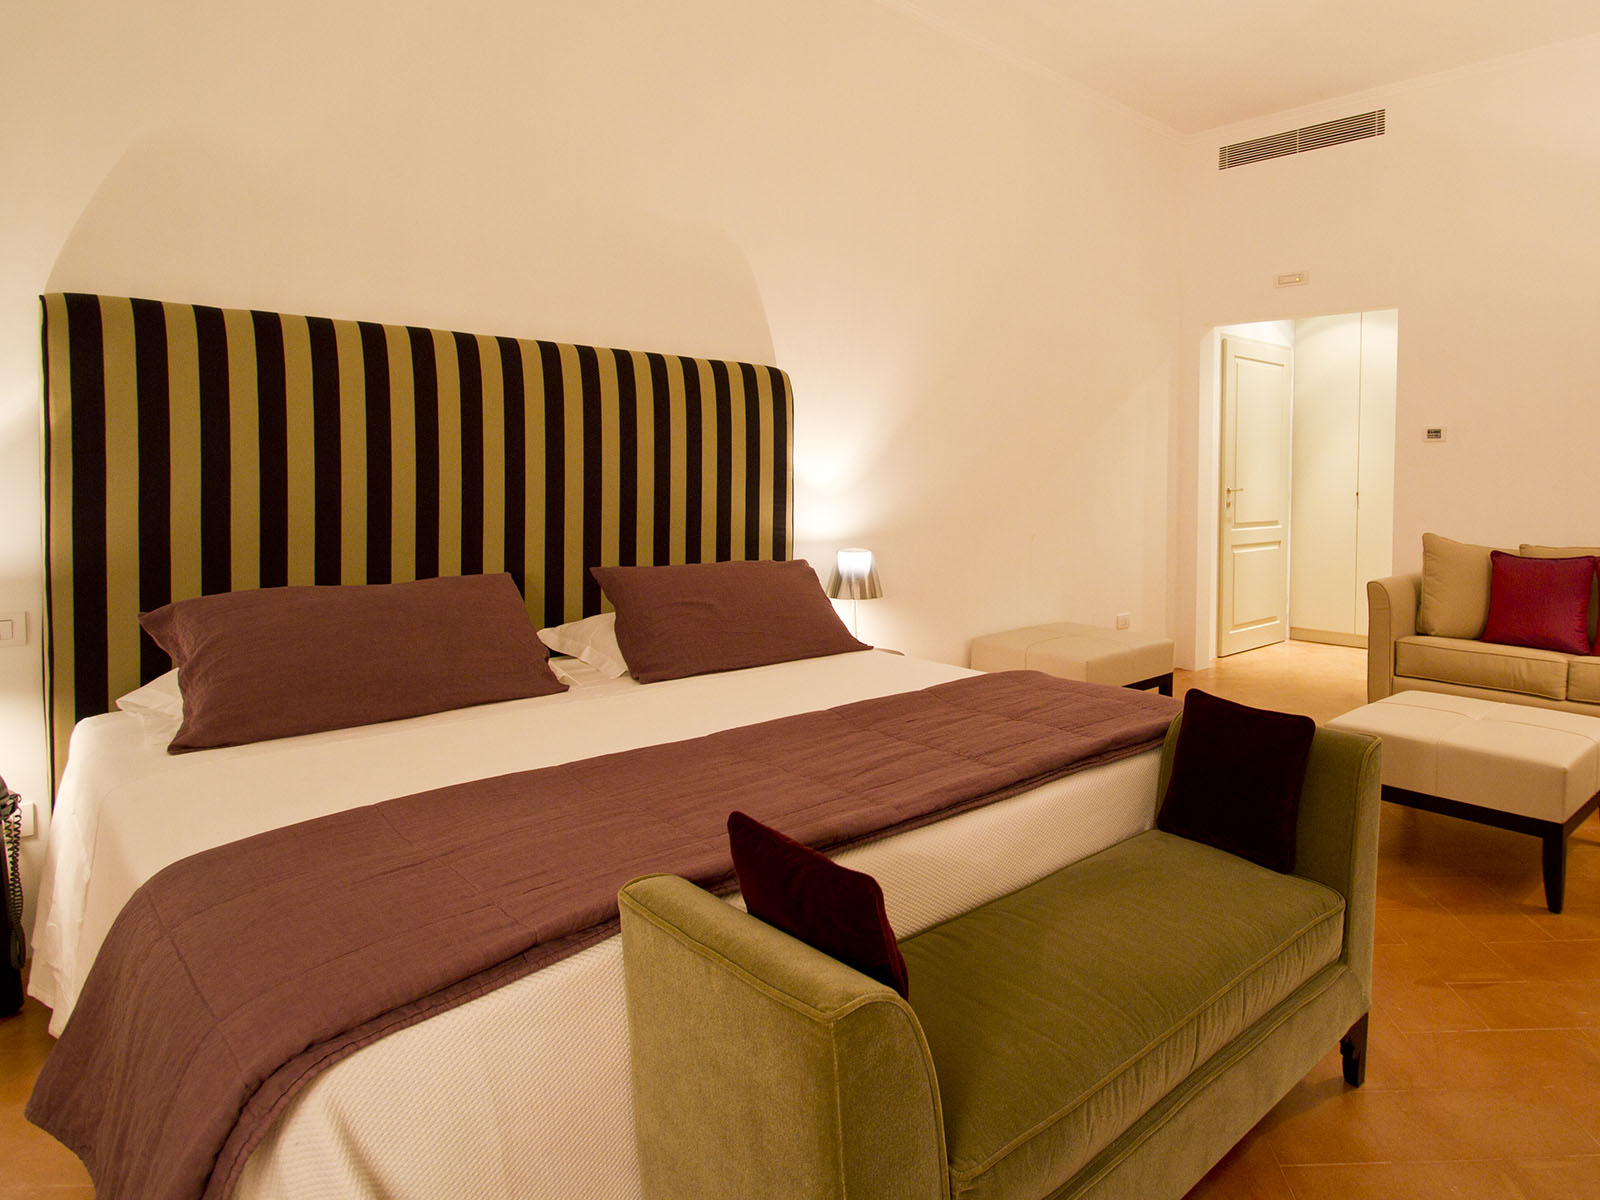 Villa Paola Room